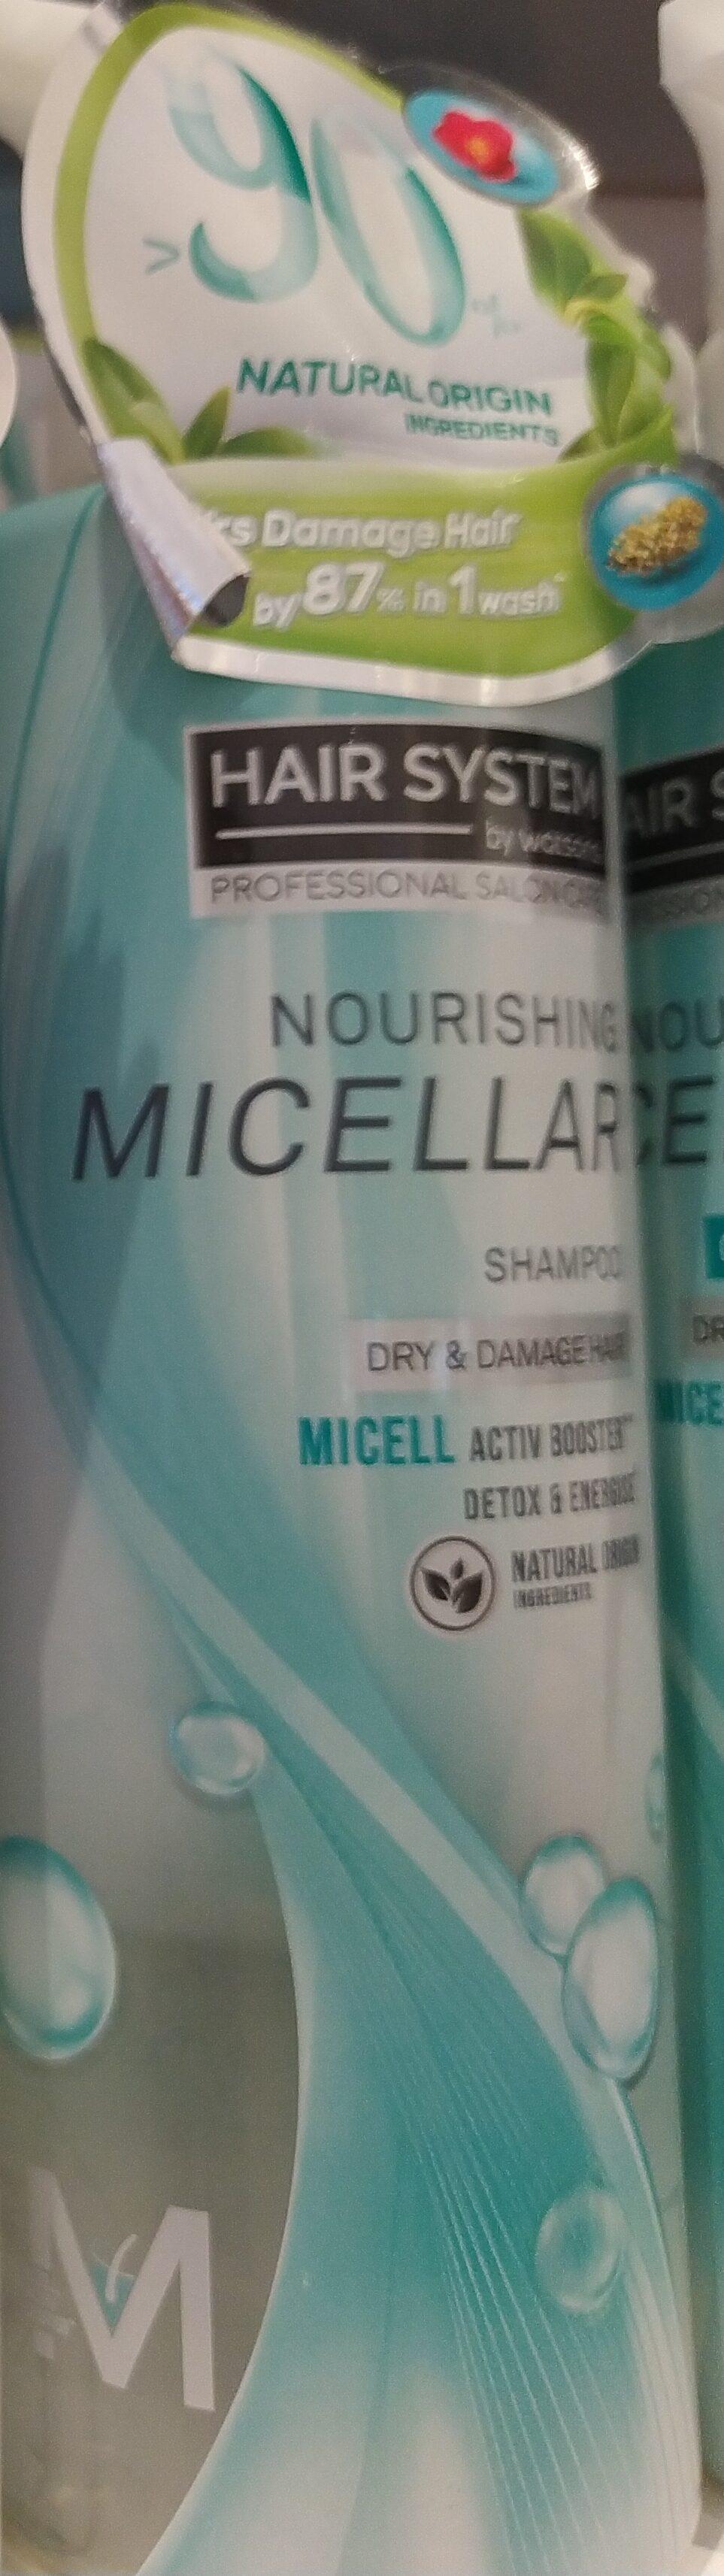 Micellar Botanical Nourishing Shampoo - Product - en